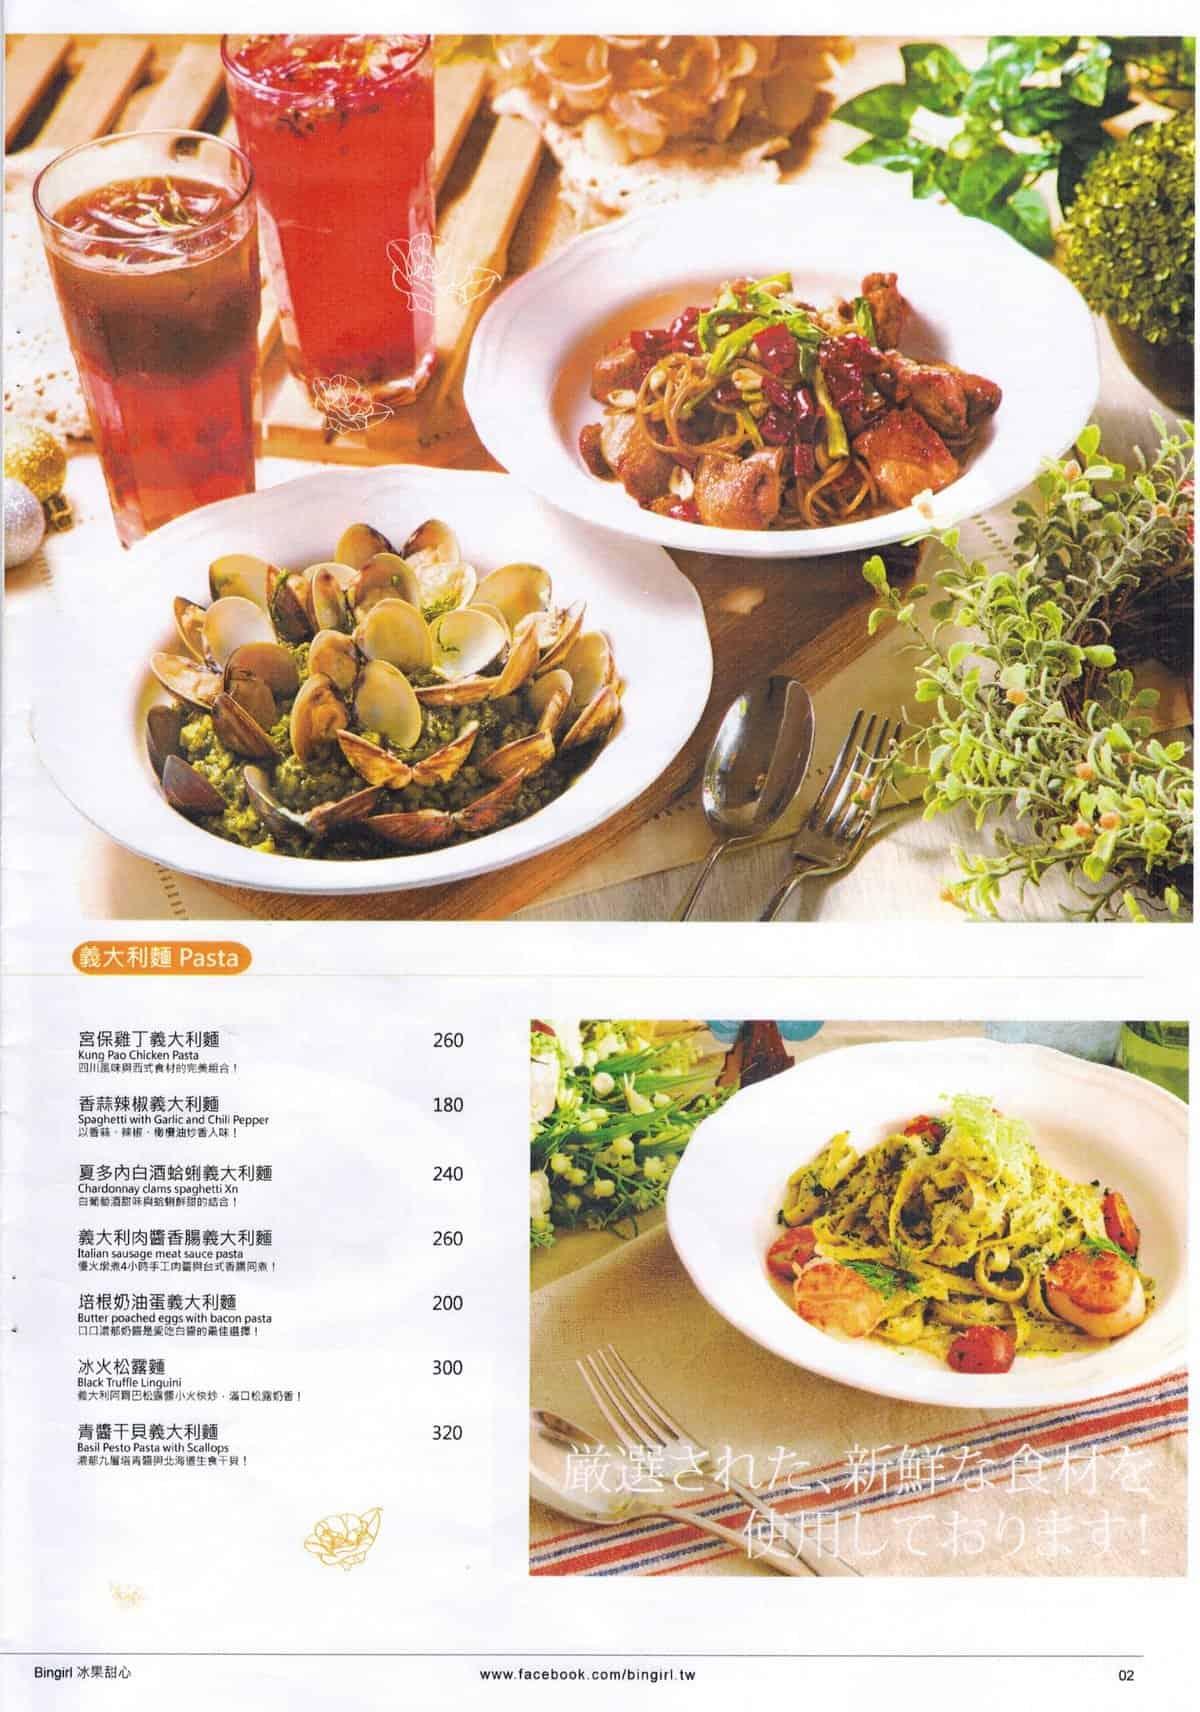 taipei-bingirl-menu3